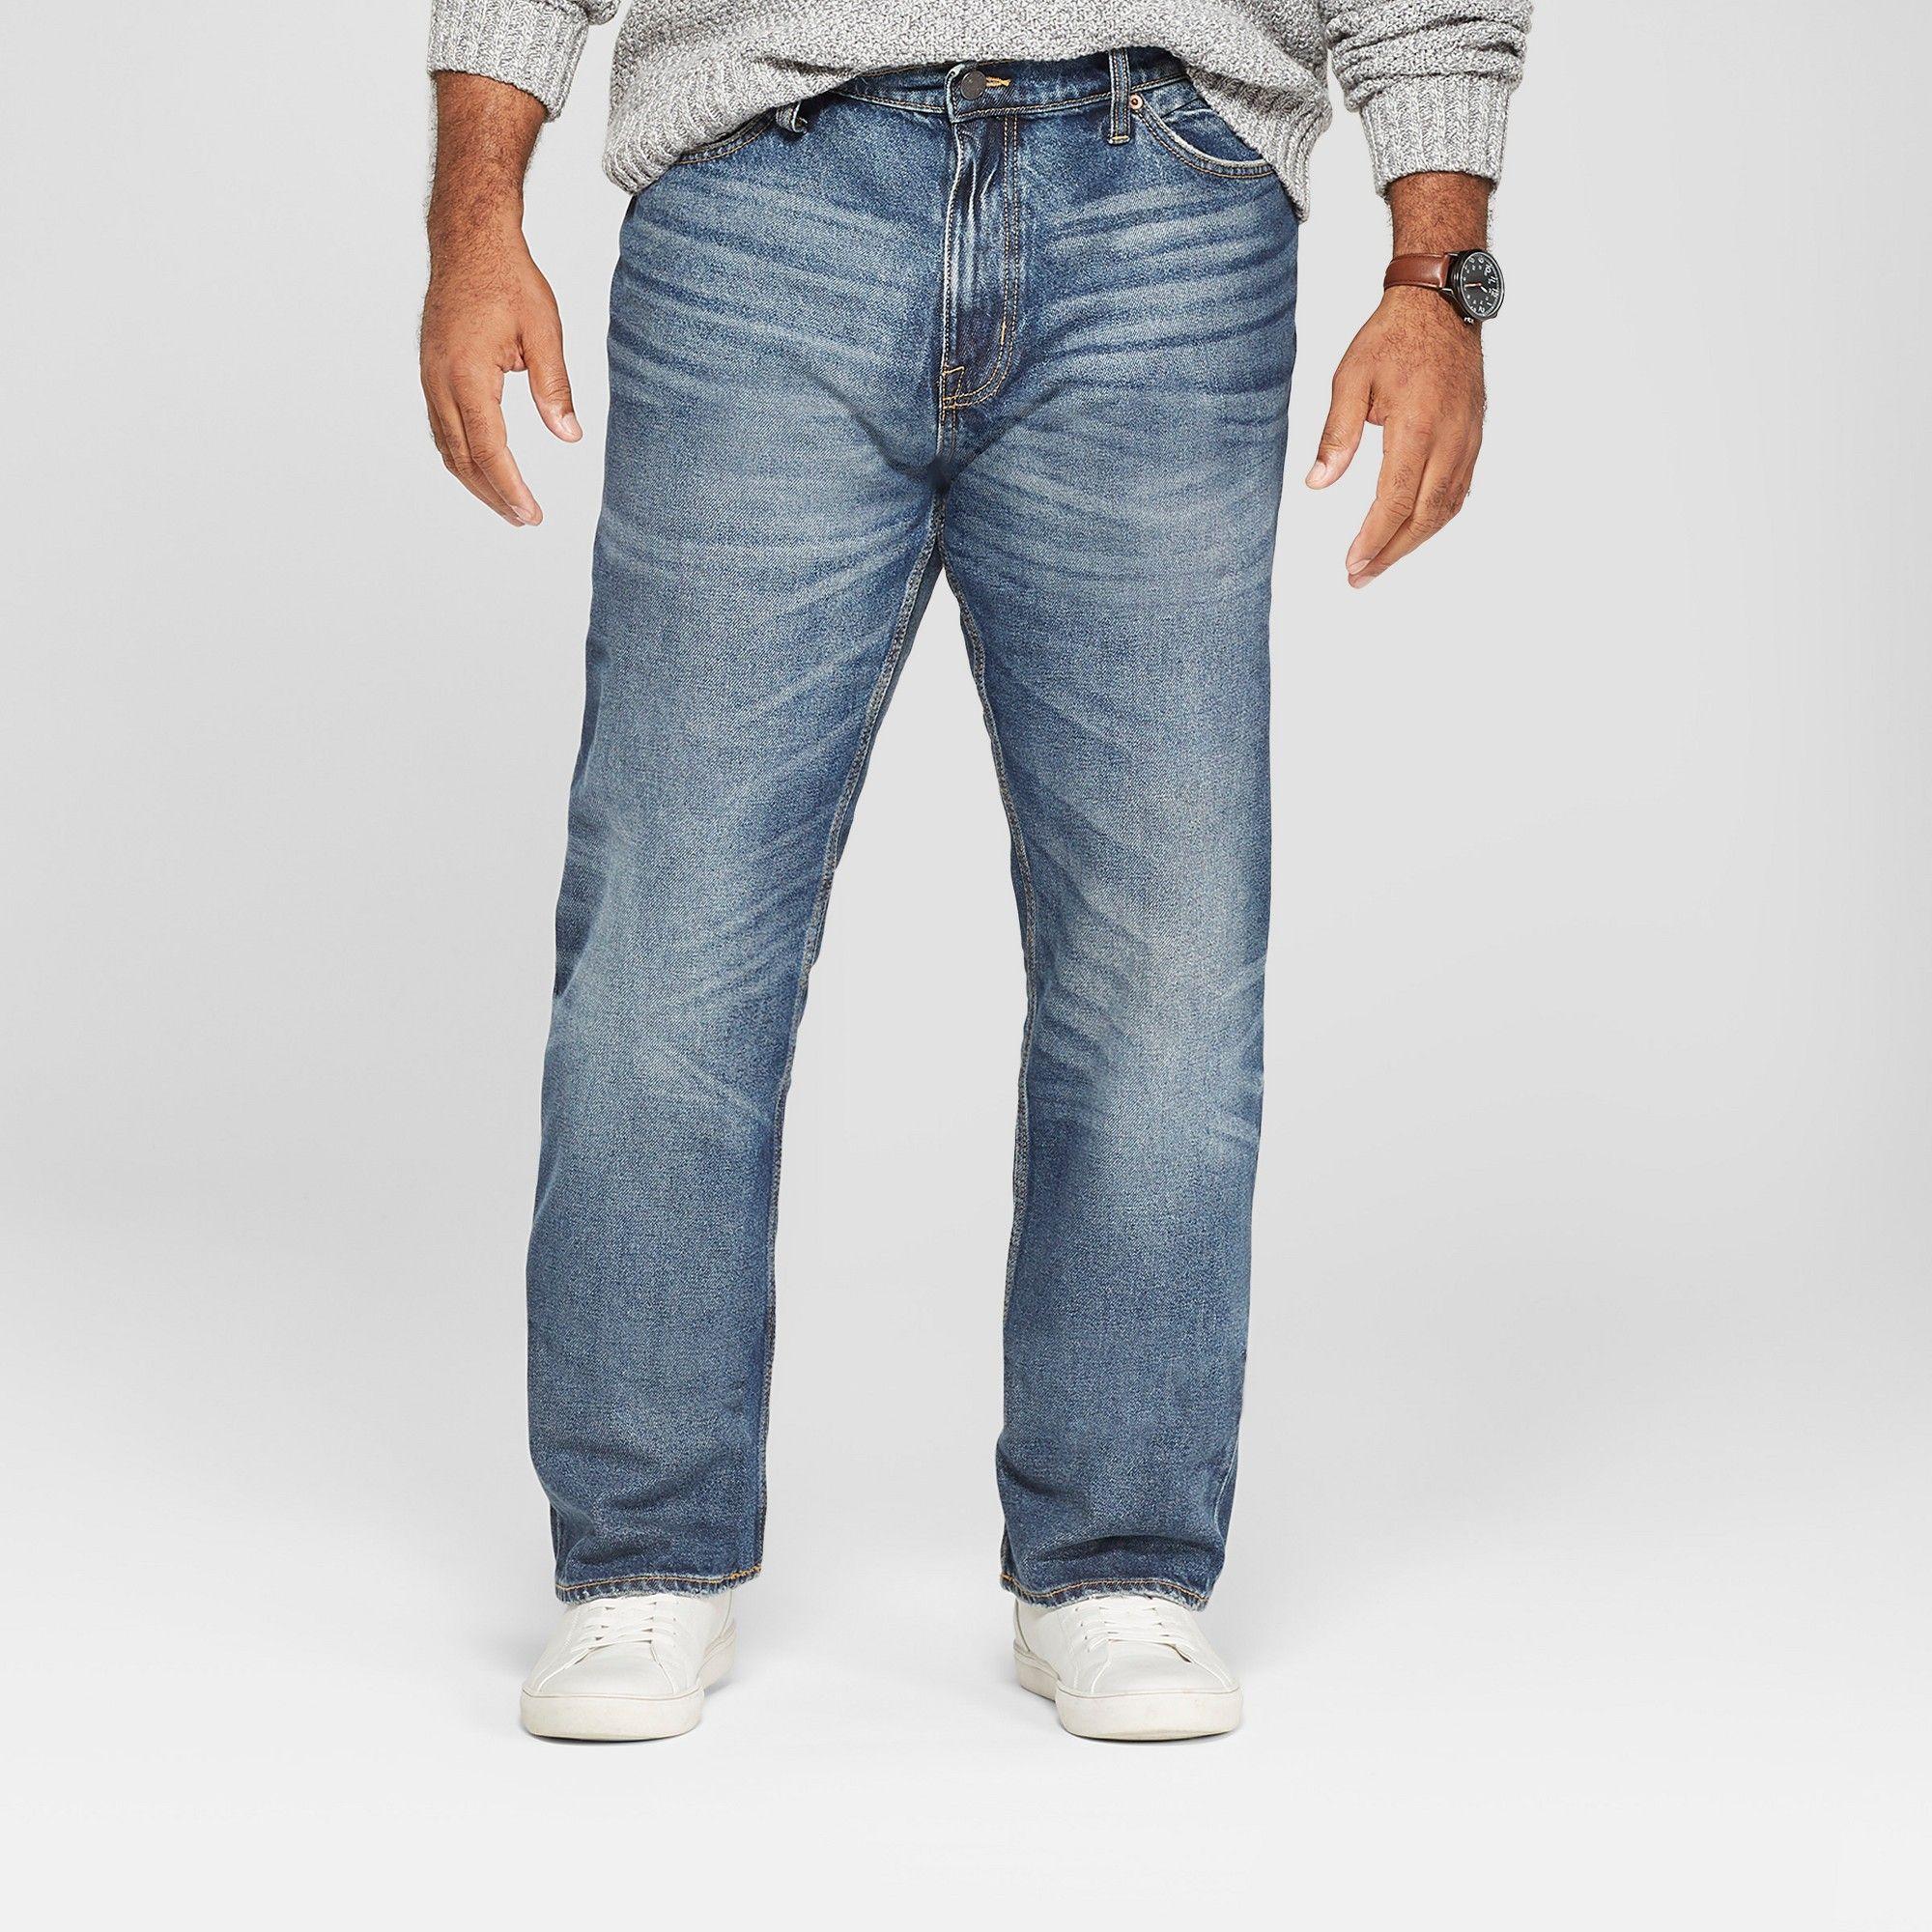 7237004d12e Men s Big   Tall Straight Fit Jeans - Goodfellow   Co Medium Vintage Wash  48x32